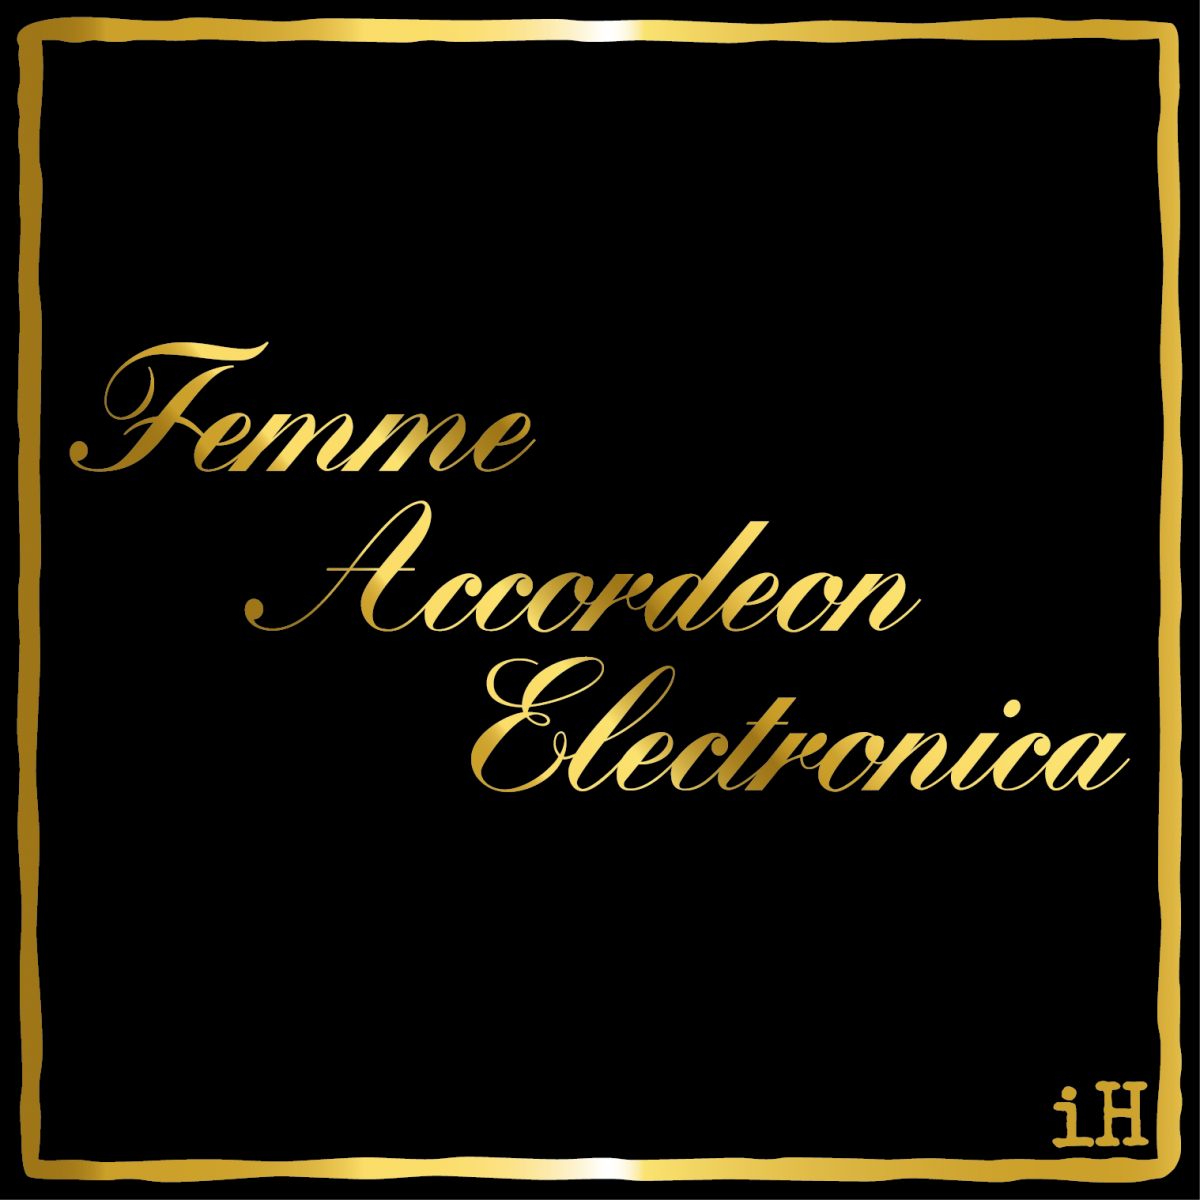 Femme Accordeon Electronica